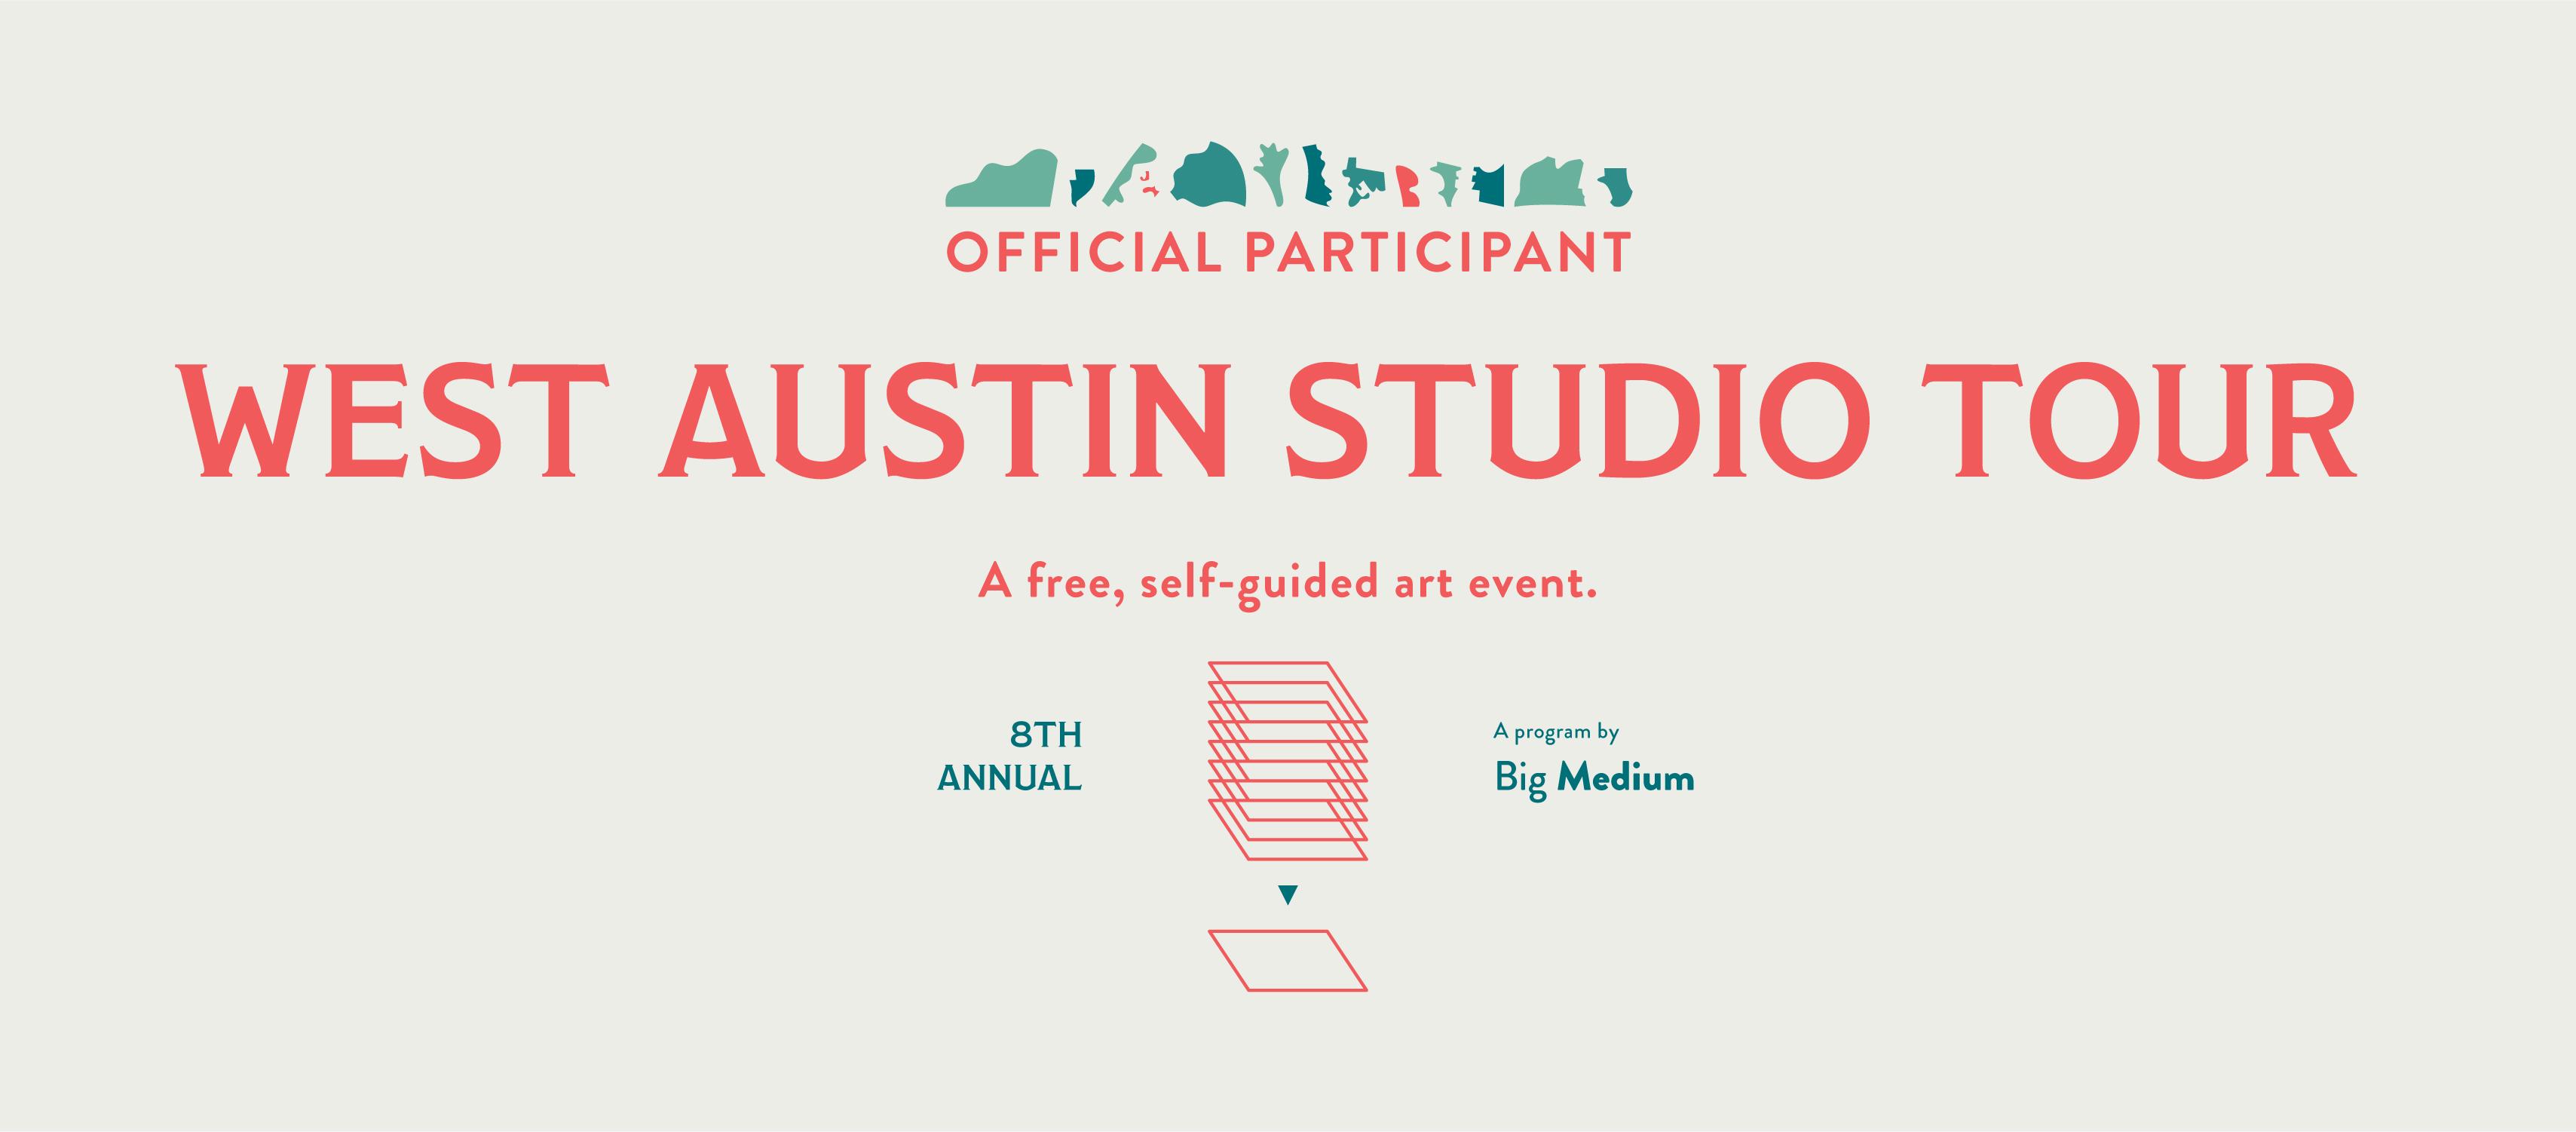 West Austin Studio Tour